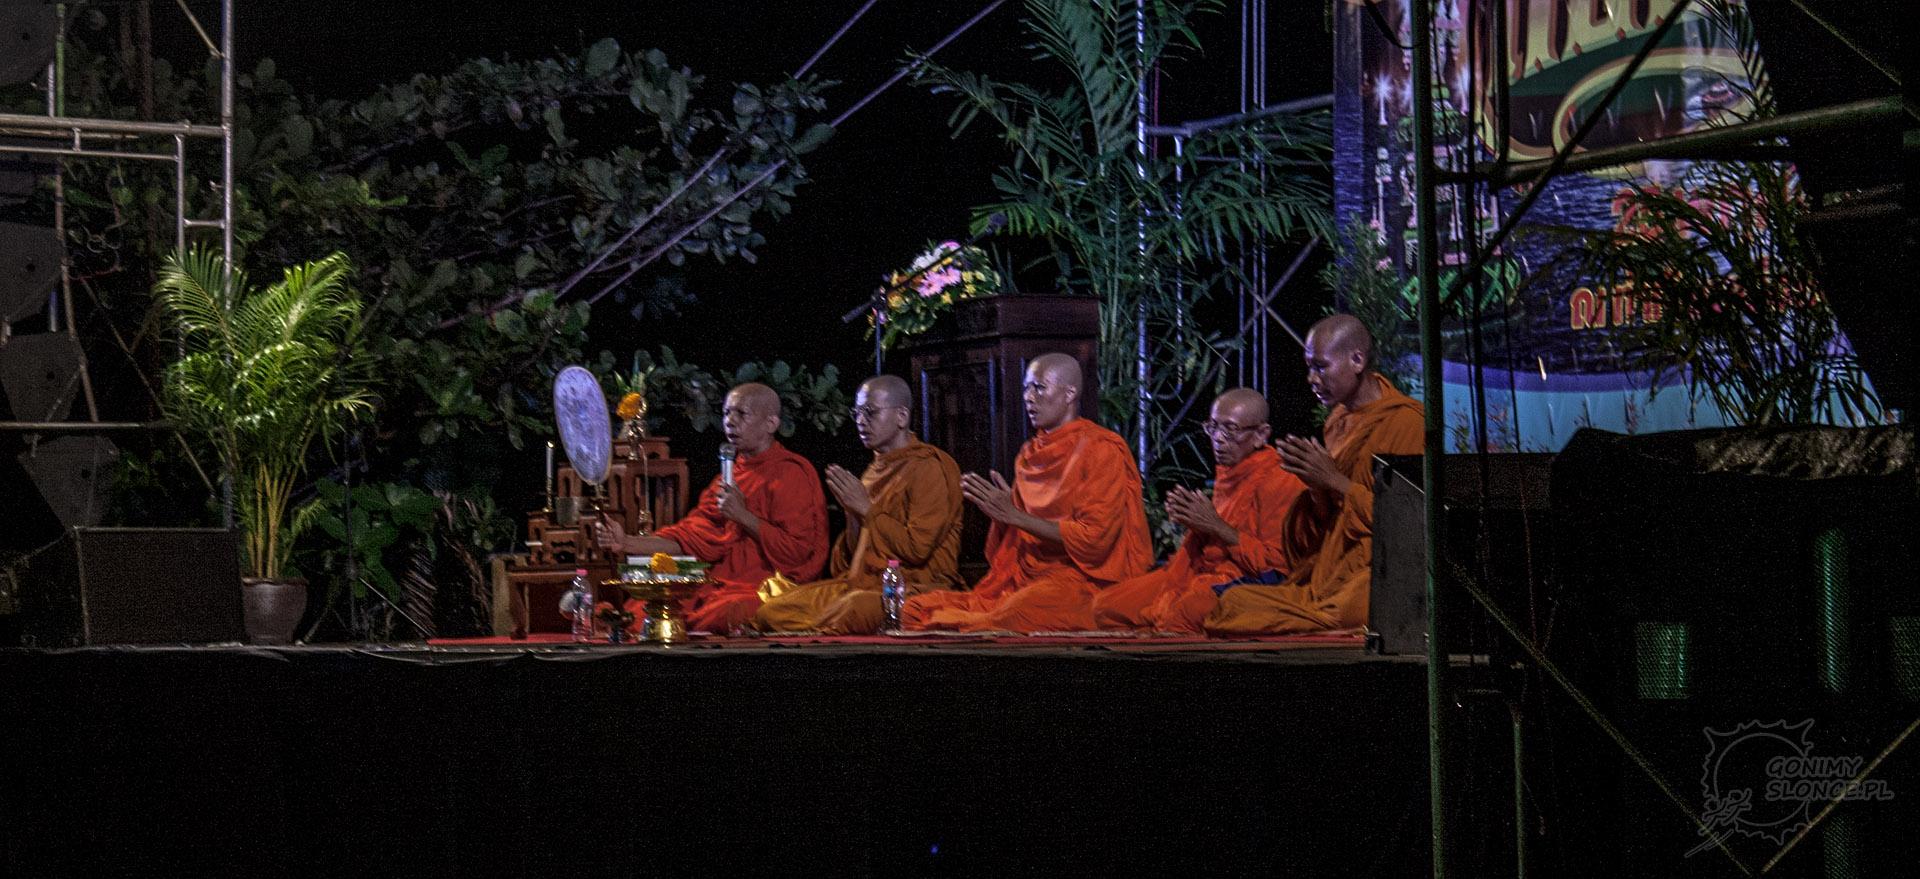 Loy Krathong i Yi Peng- święto lampionów w Tajlandii